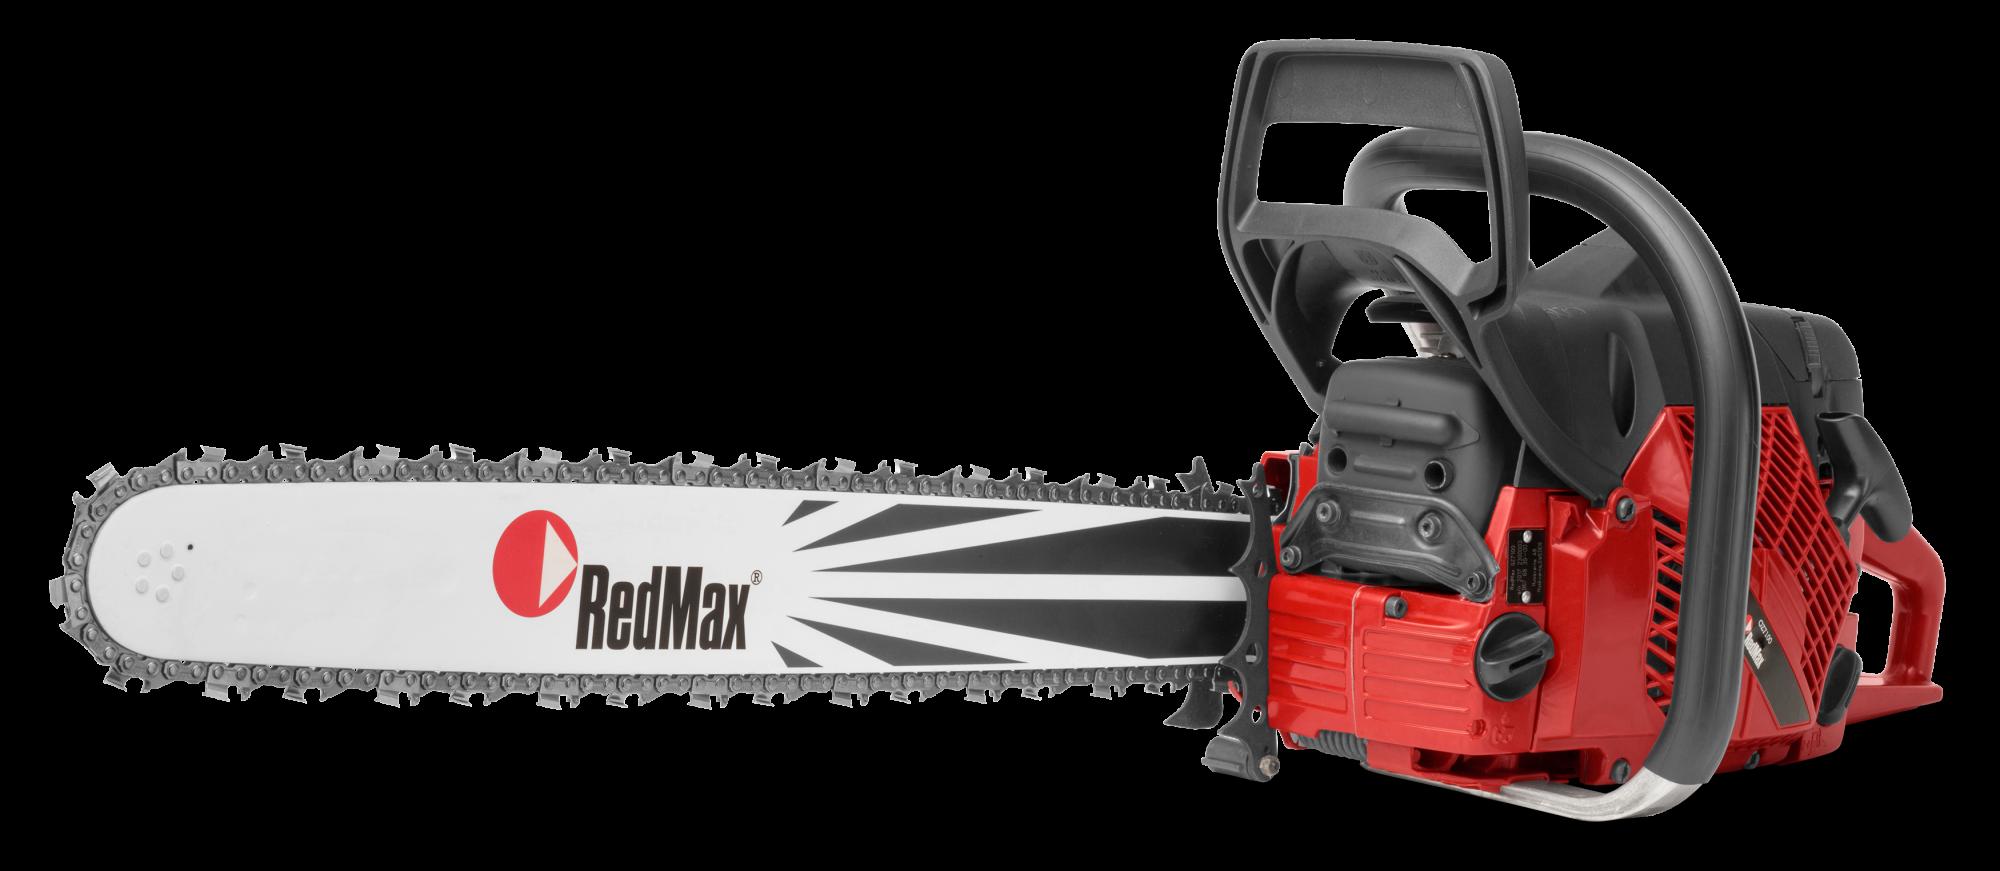 RedMax Chainsaw 20 Bar